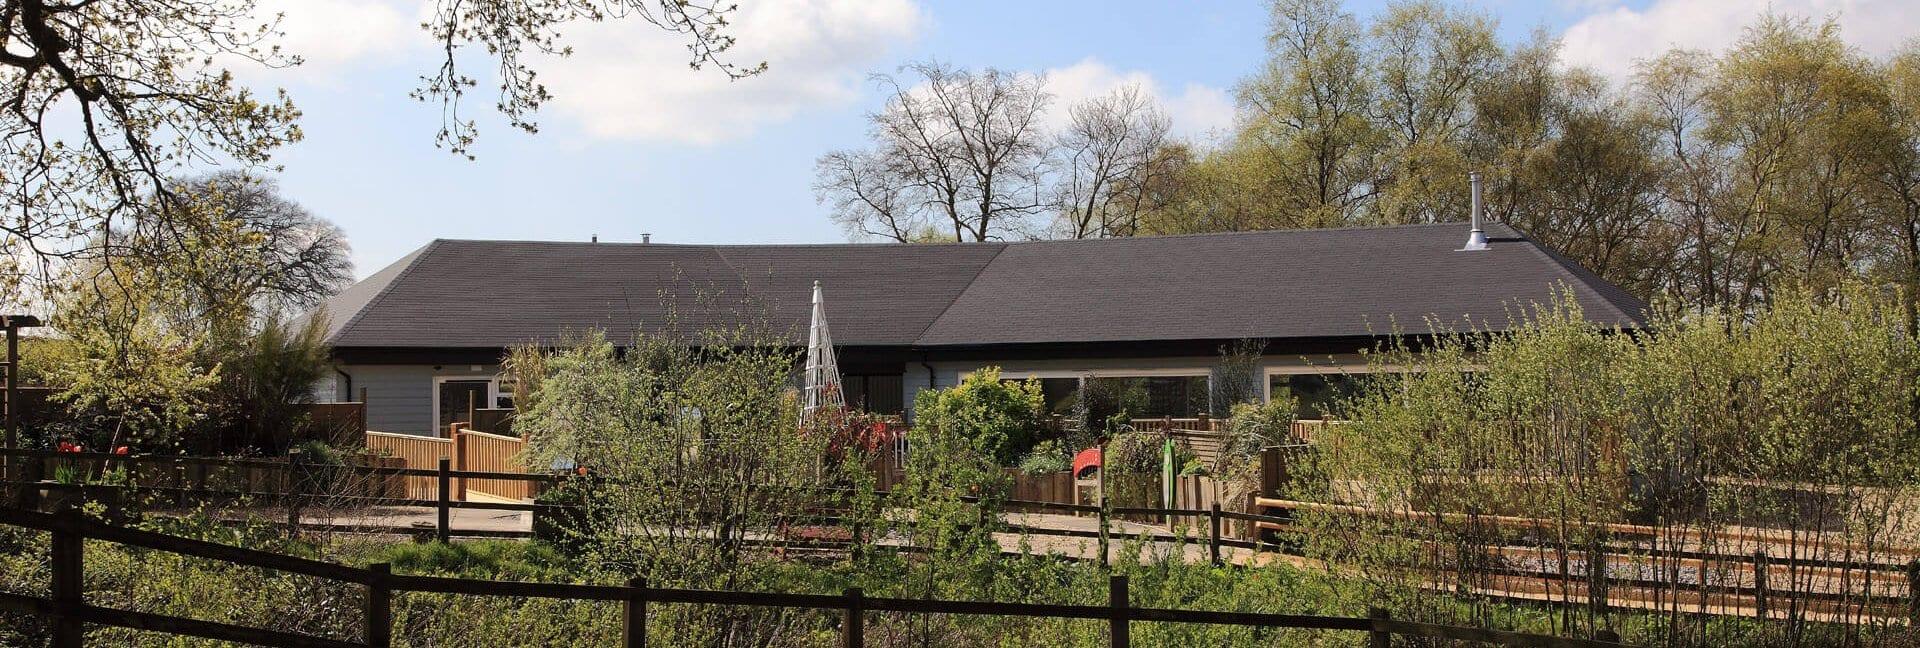 Ferne Animal Sanctuary Visitor Centre